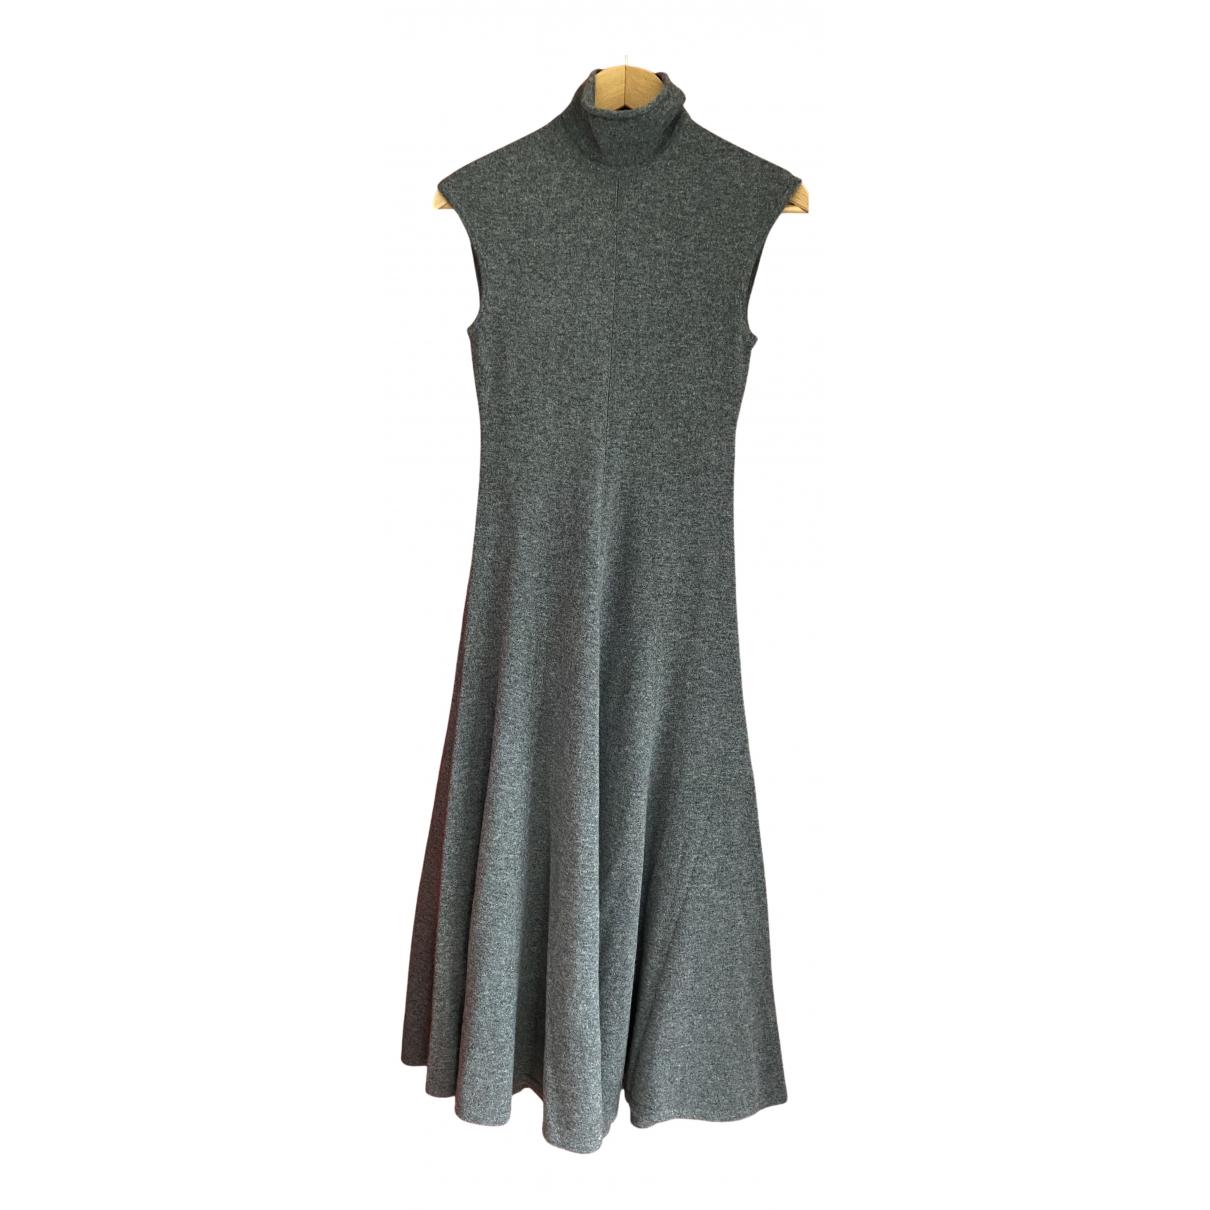 Polo Ralph Lauren N Grey Cashmere dress for Women S International